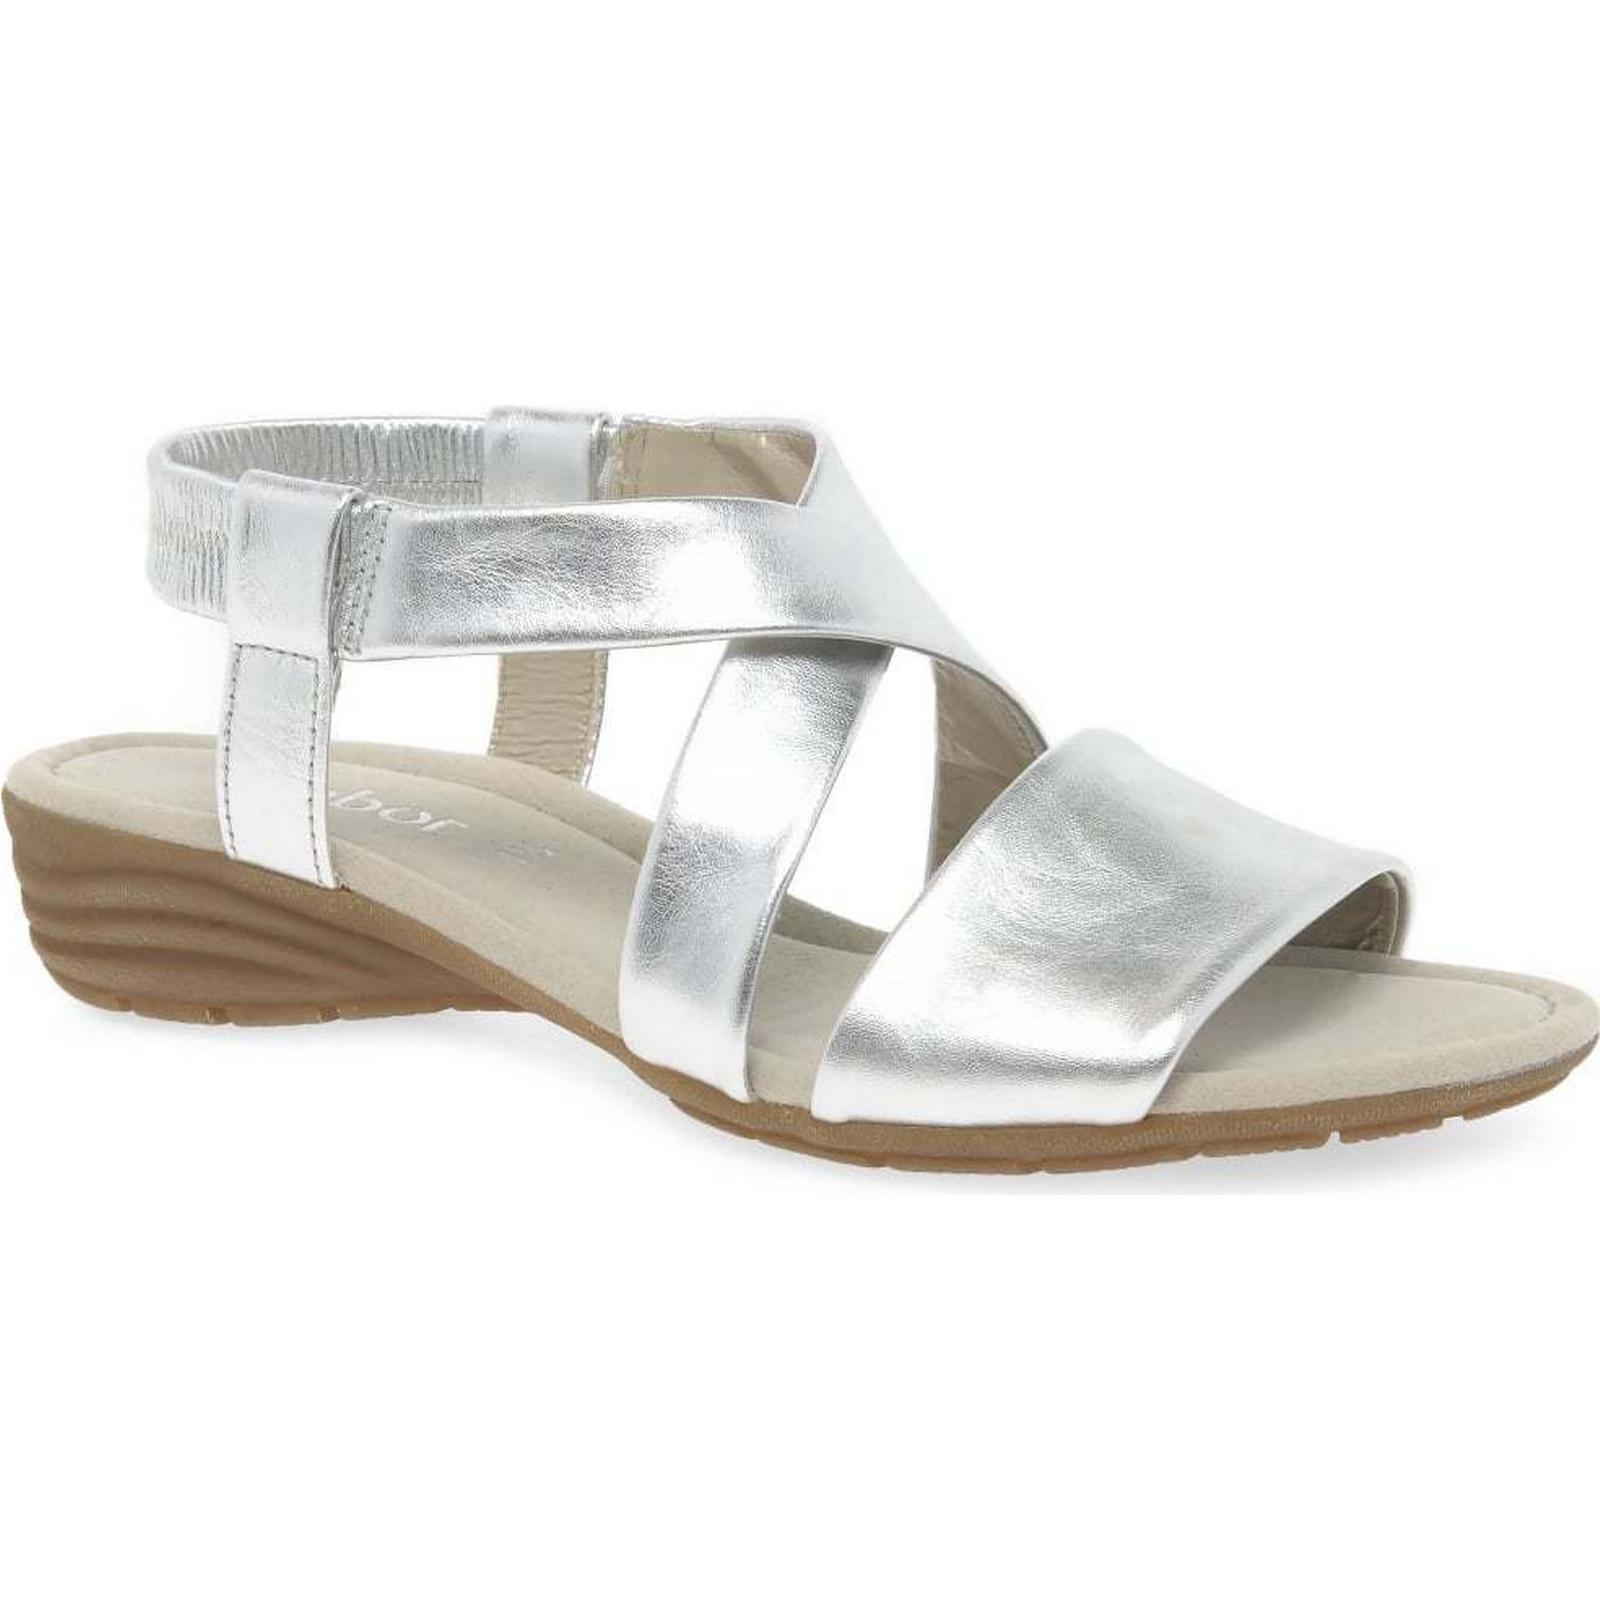 Gabor Ensign Womens Casual 9 Sandals Colour: Silver, Size: 9 Casual e95e09